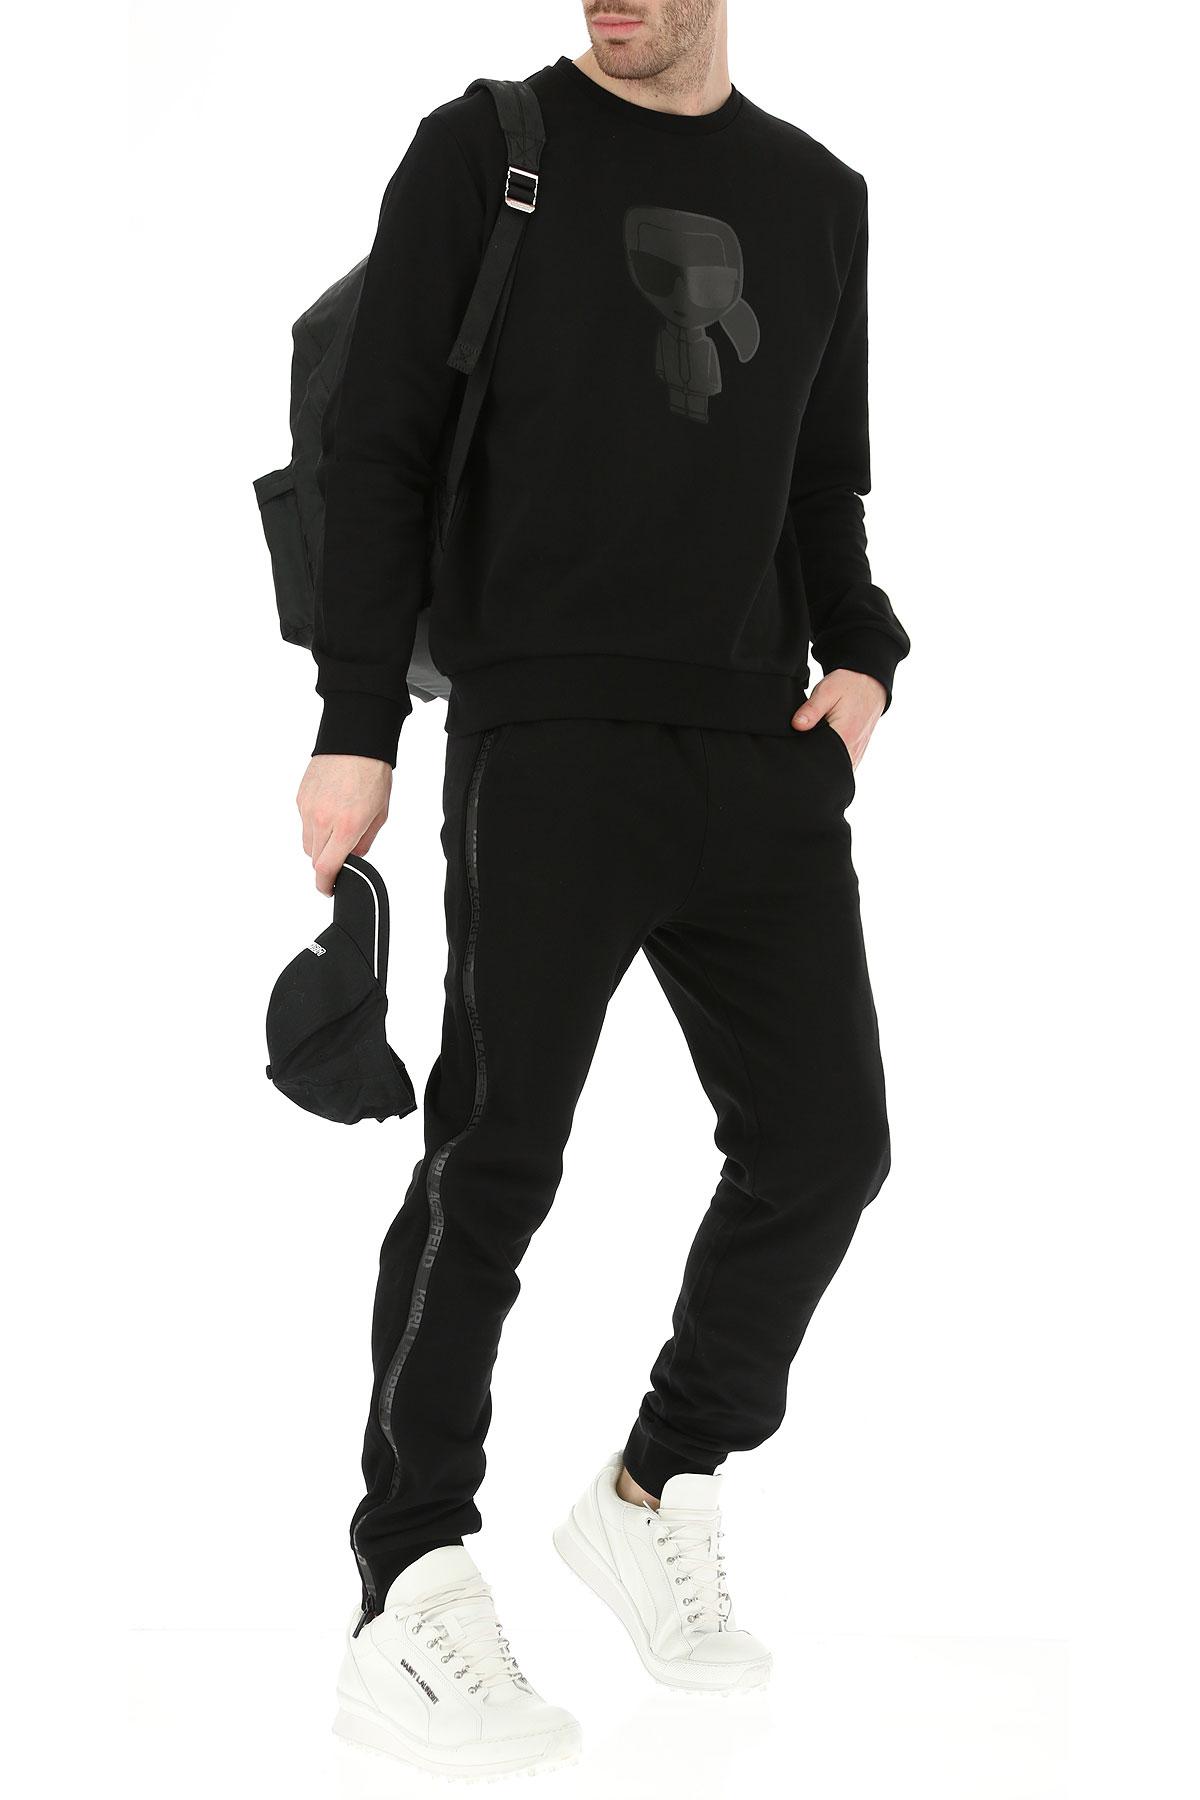 nbsp; Para Negro Lagerfeld verano Karl Primavera 2019 Ropa Hombres ZHzqU8w